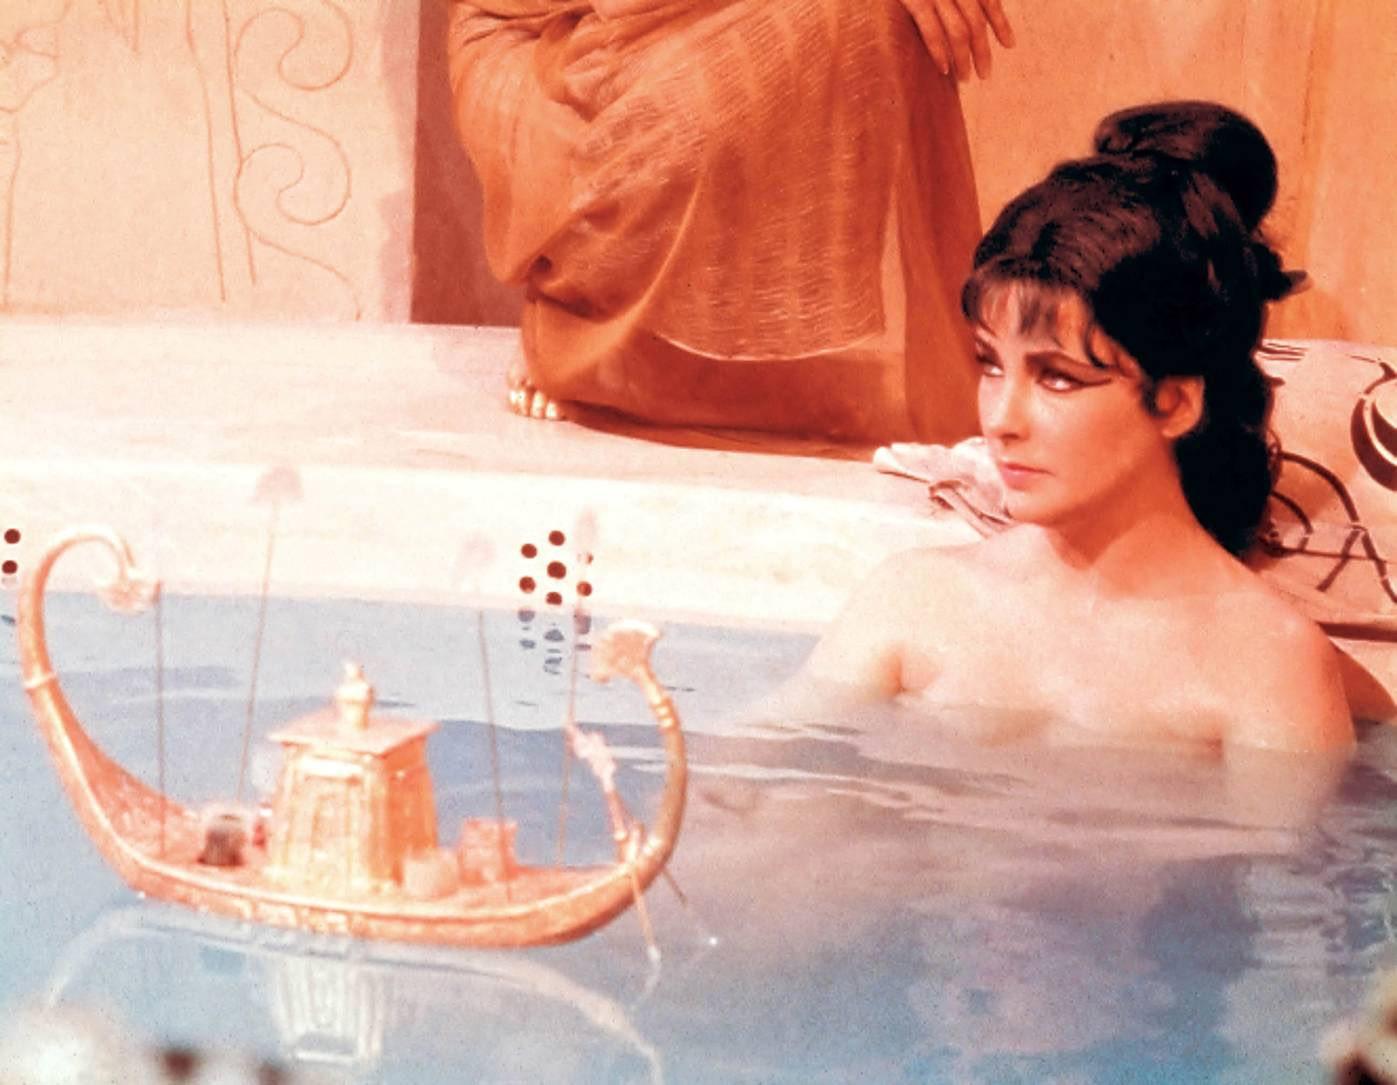 http://3.bp.blogspot.com/-O-NvaO1RO4w/TYoQ323bG8I/AAAAAAAAea8/k7V5VrLec7E/s1600/Cleopatra-1963-elizabeth-taylor-16282319-1397-1085.jpg